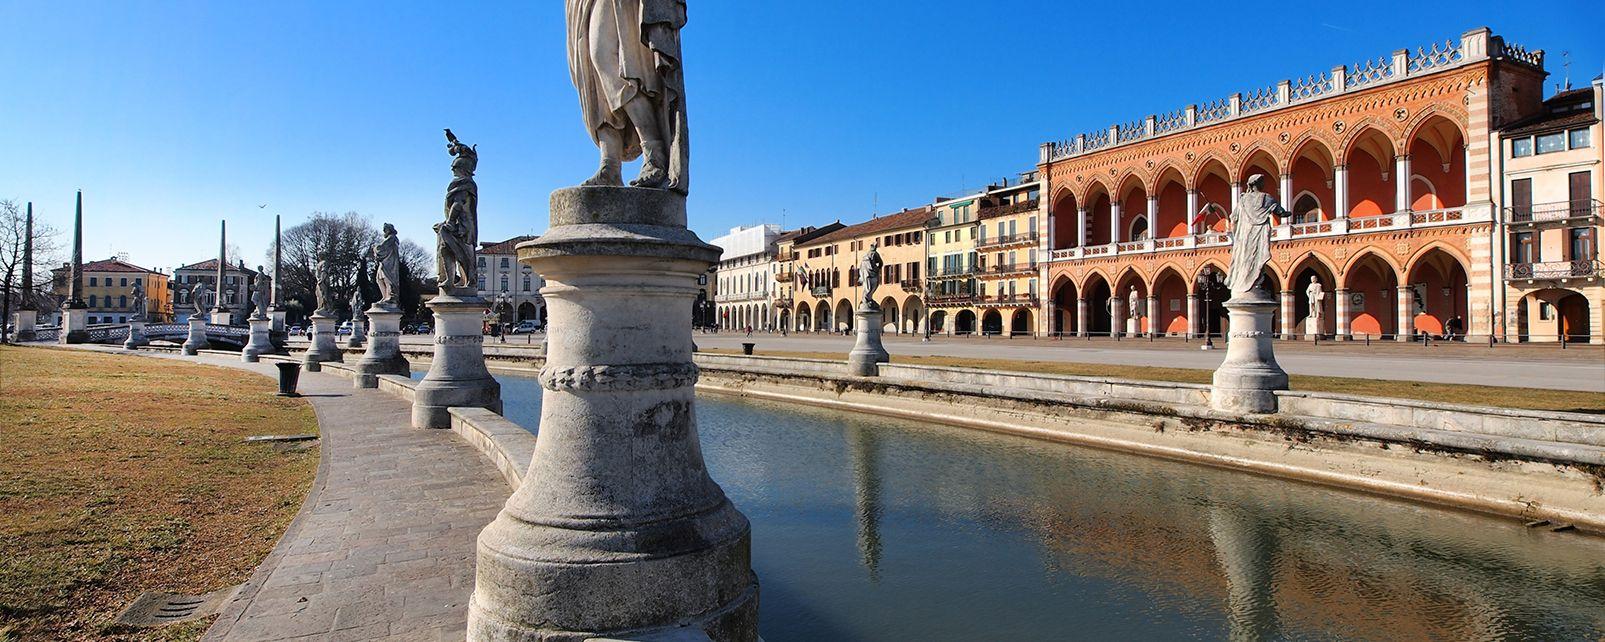 Piave River , Italie